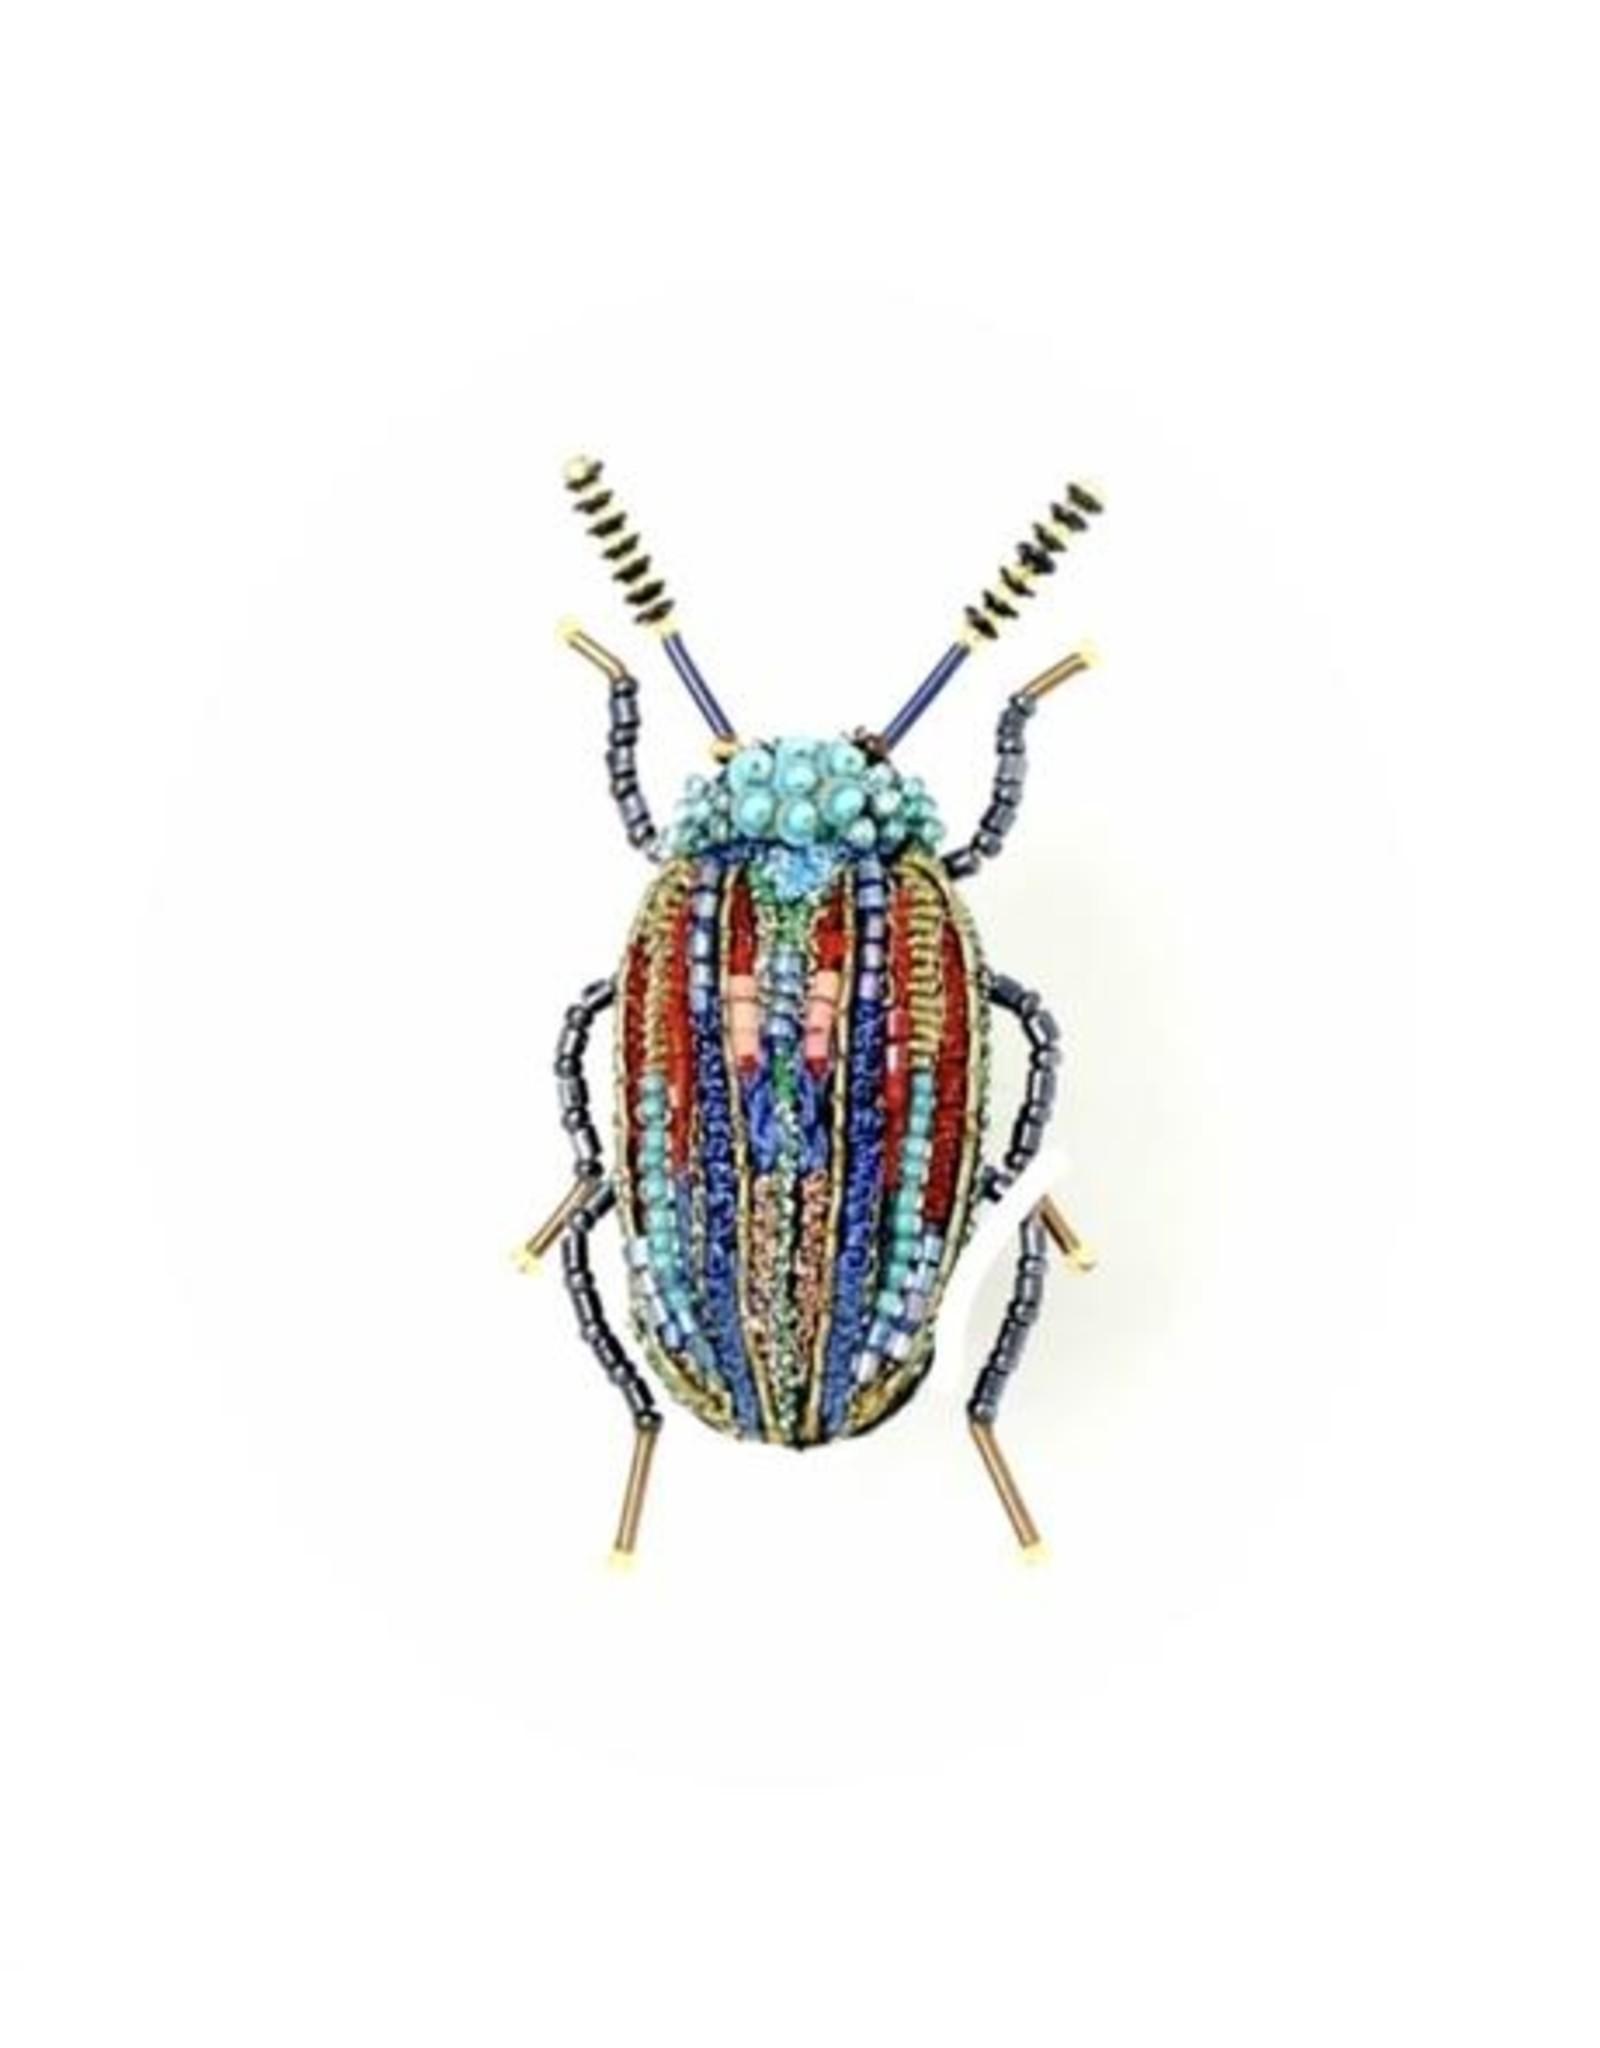 Snowdon Beetle Brooch Pin